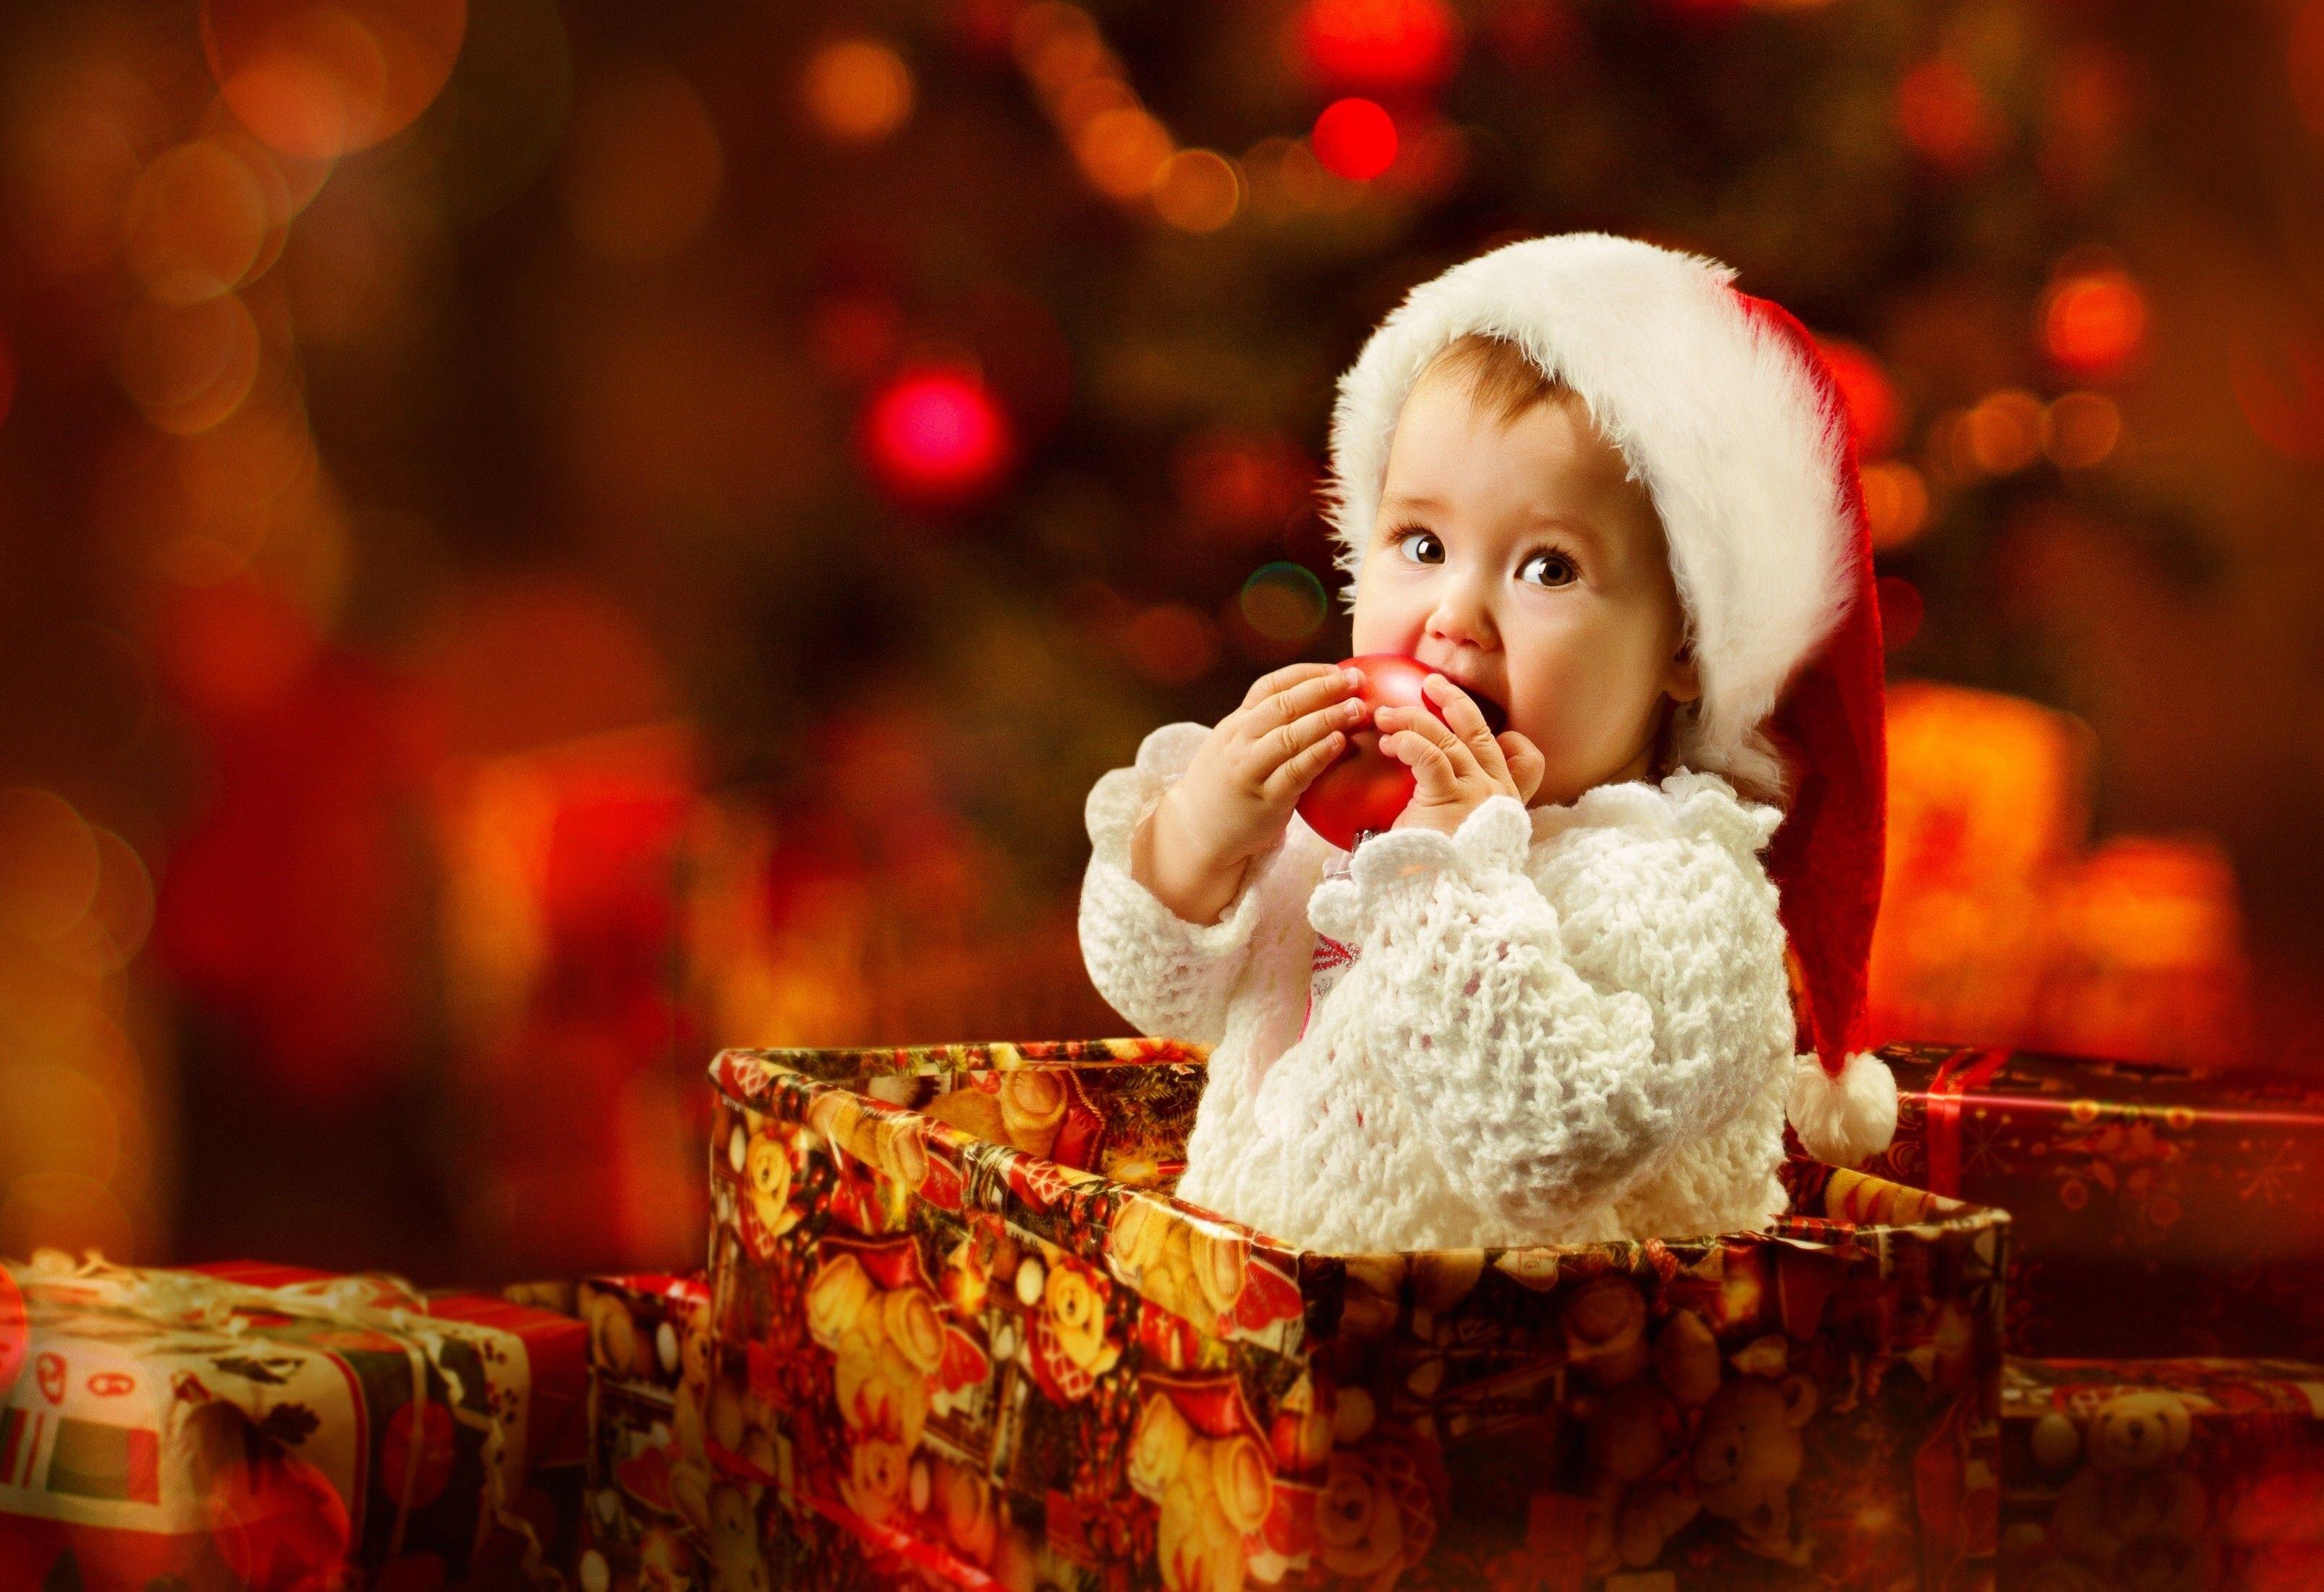 Christmas Baby Images Hd.Christmas Baby New Hd Wallpaper Wallpapers Siblings Baby